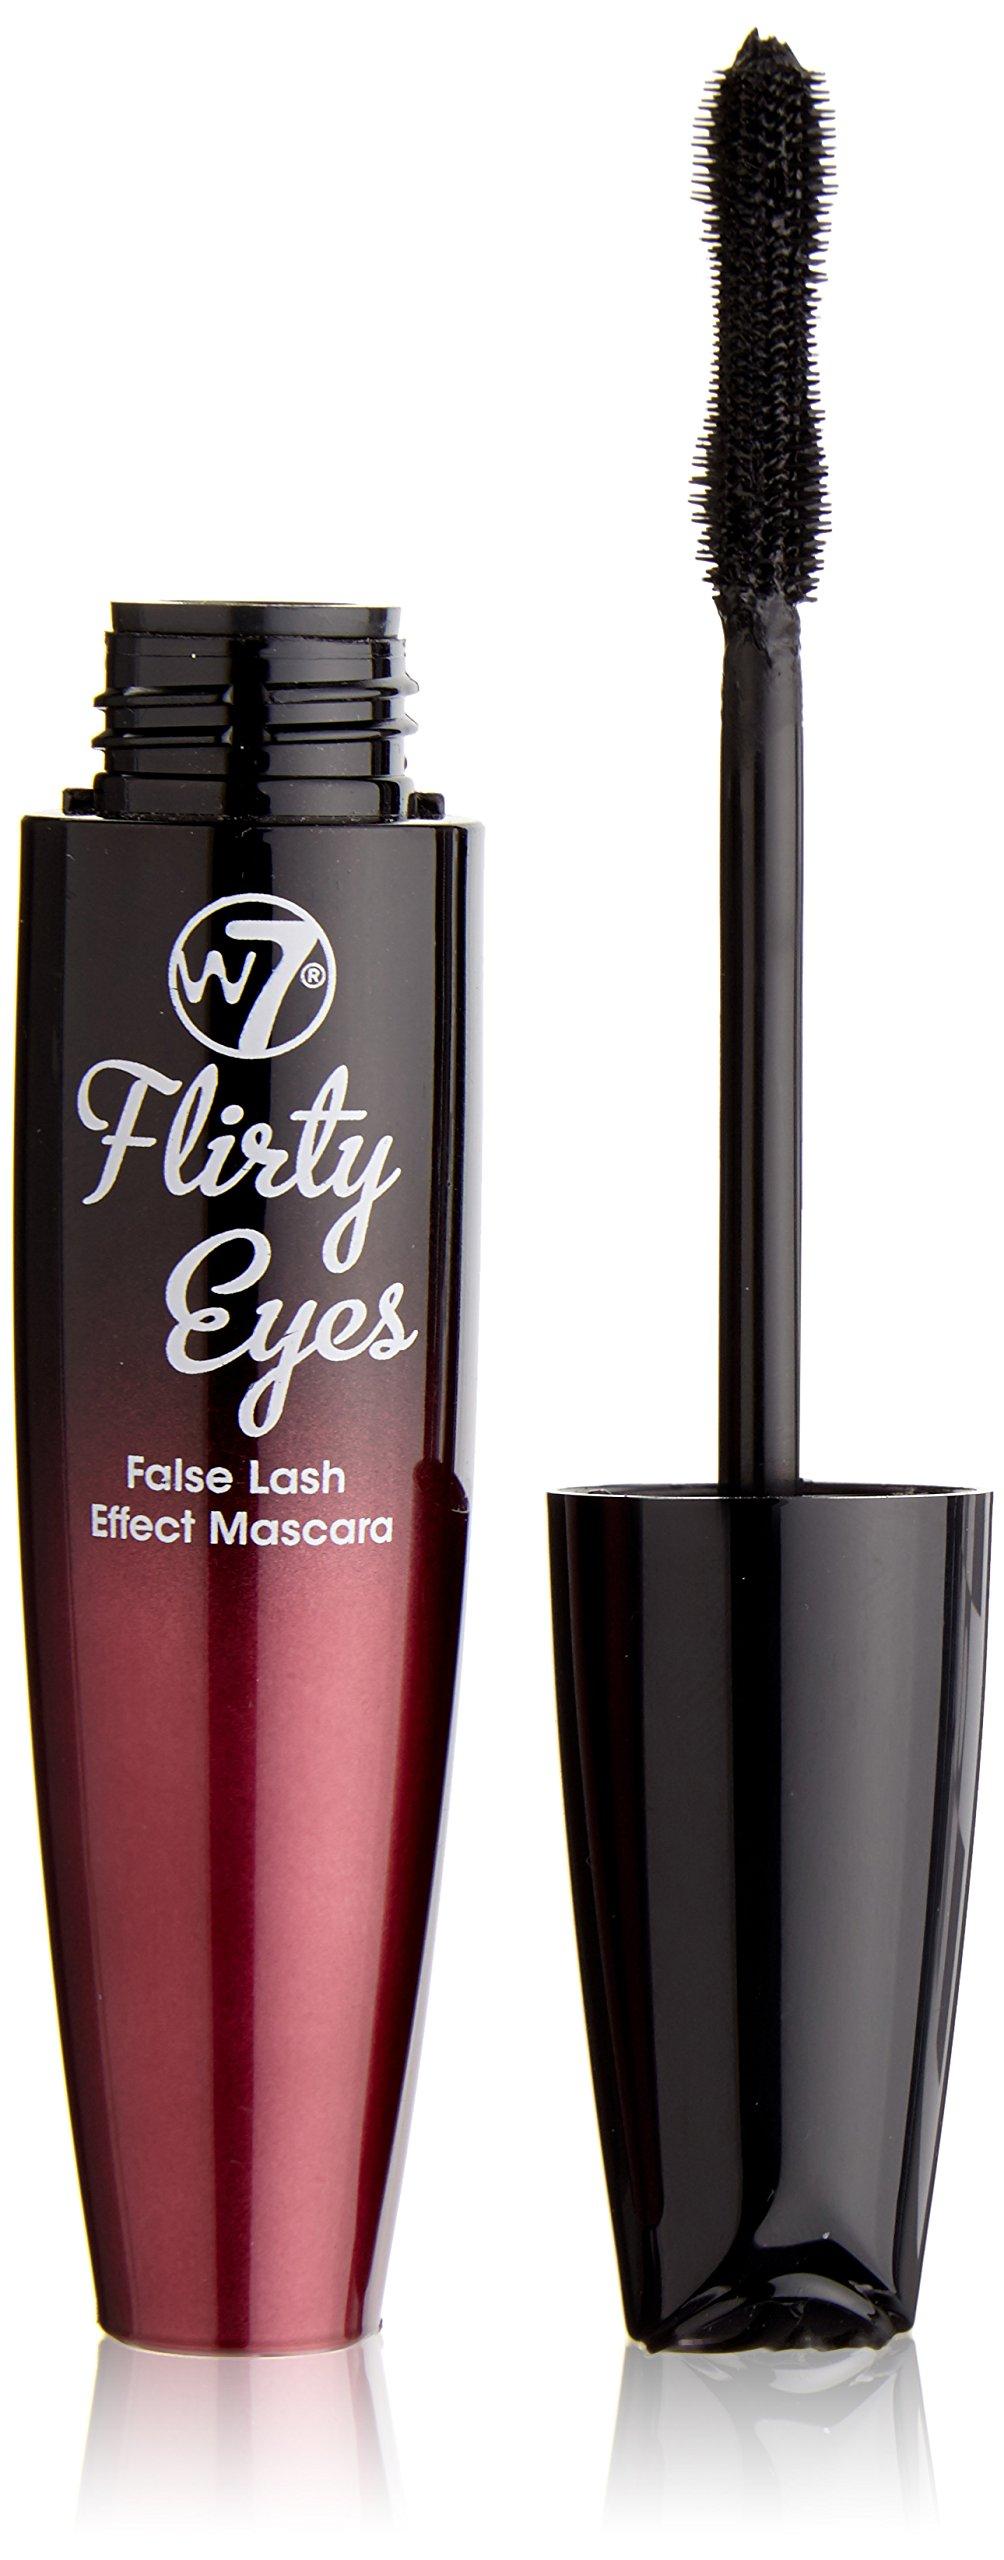 Lashtastic False Liquid Lashes Mascara by w7 #16